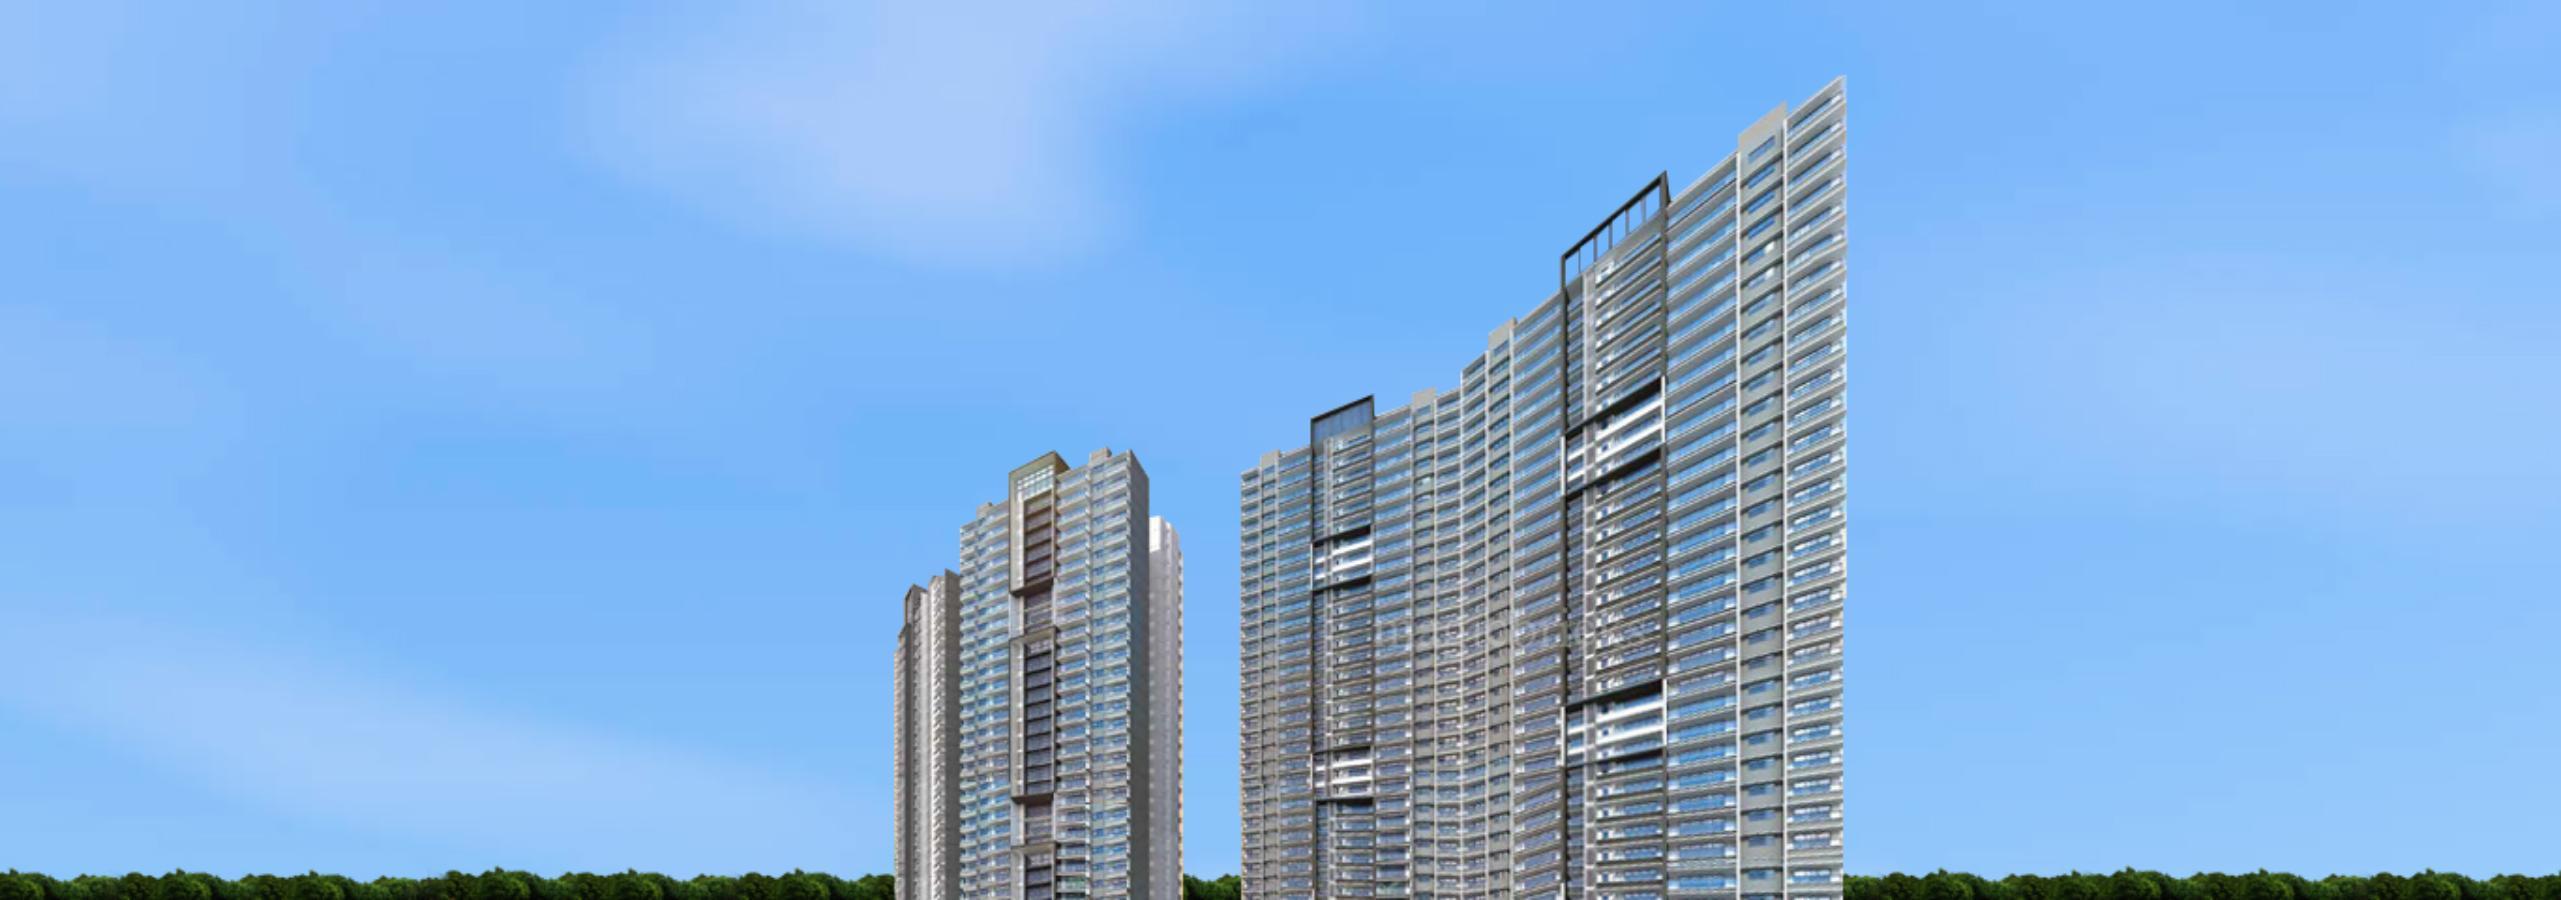 Studio Apartment Amanora amanora park township in hadapsar, punecity corporation ltd